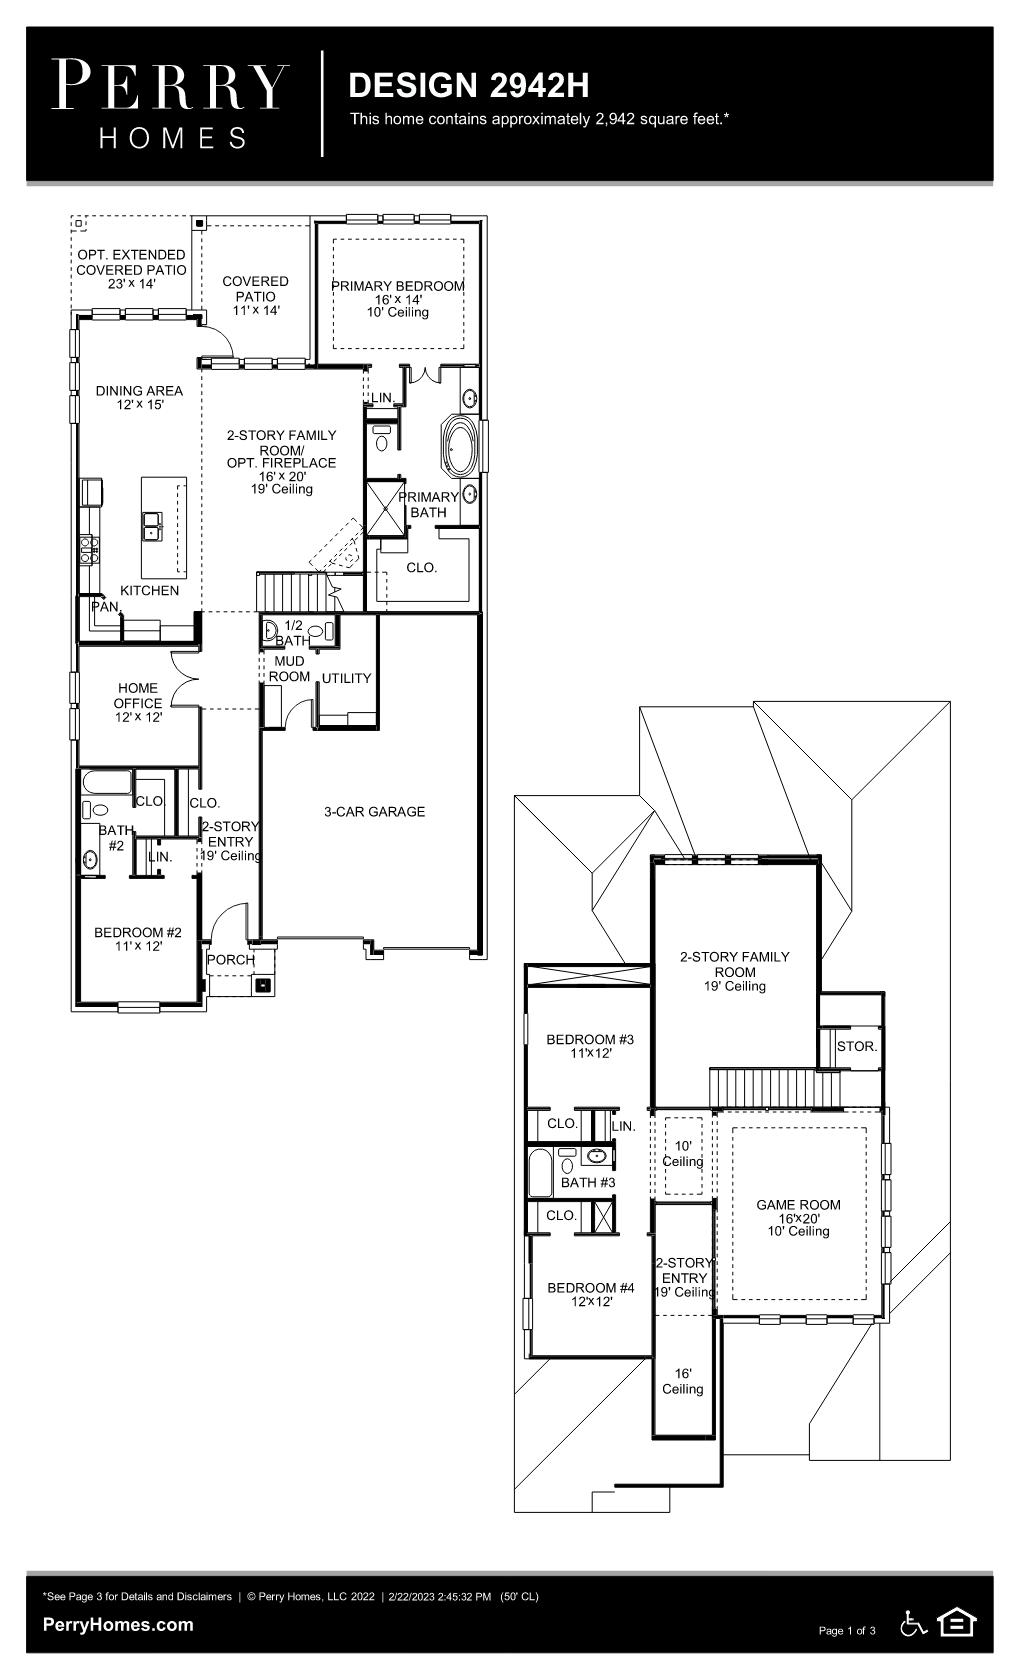 Floor Plan for 2942H